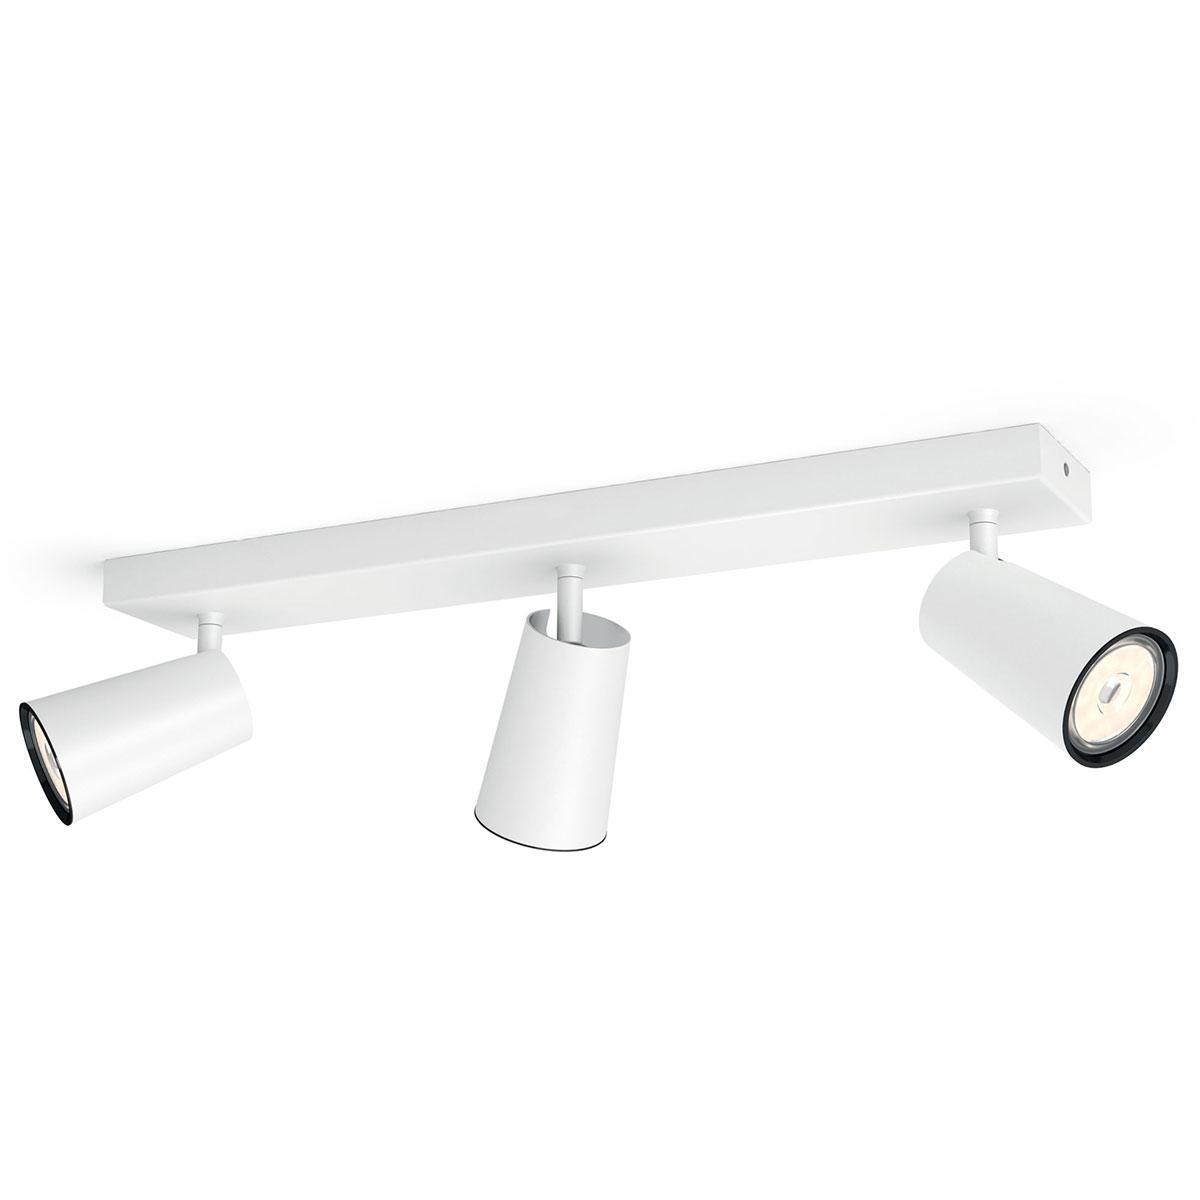 Image of   Philips myLiving loftlampe med spot - Paisley - Hvid